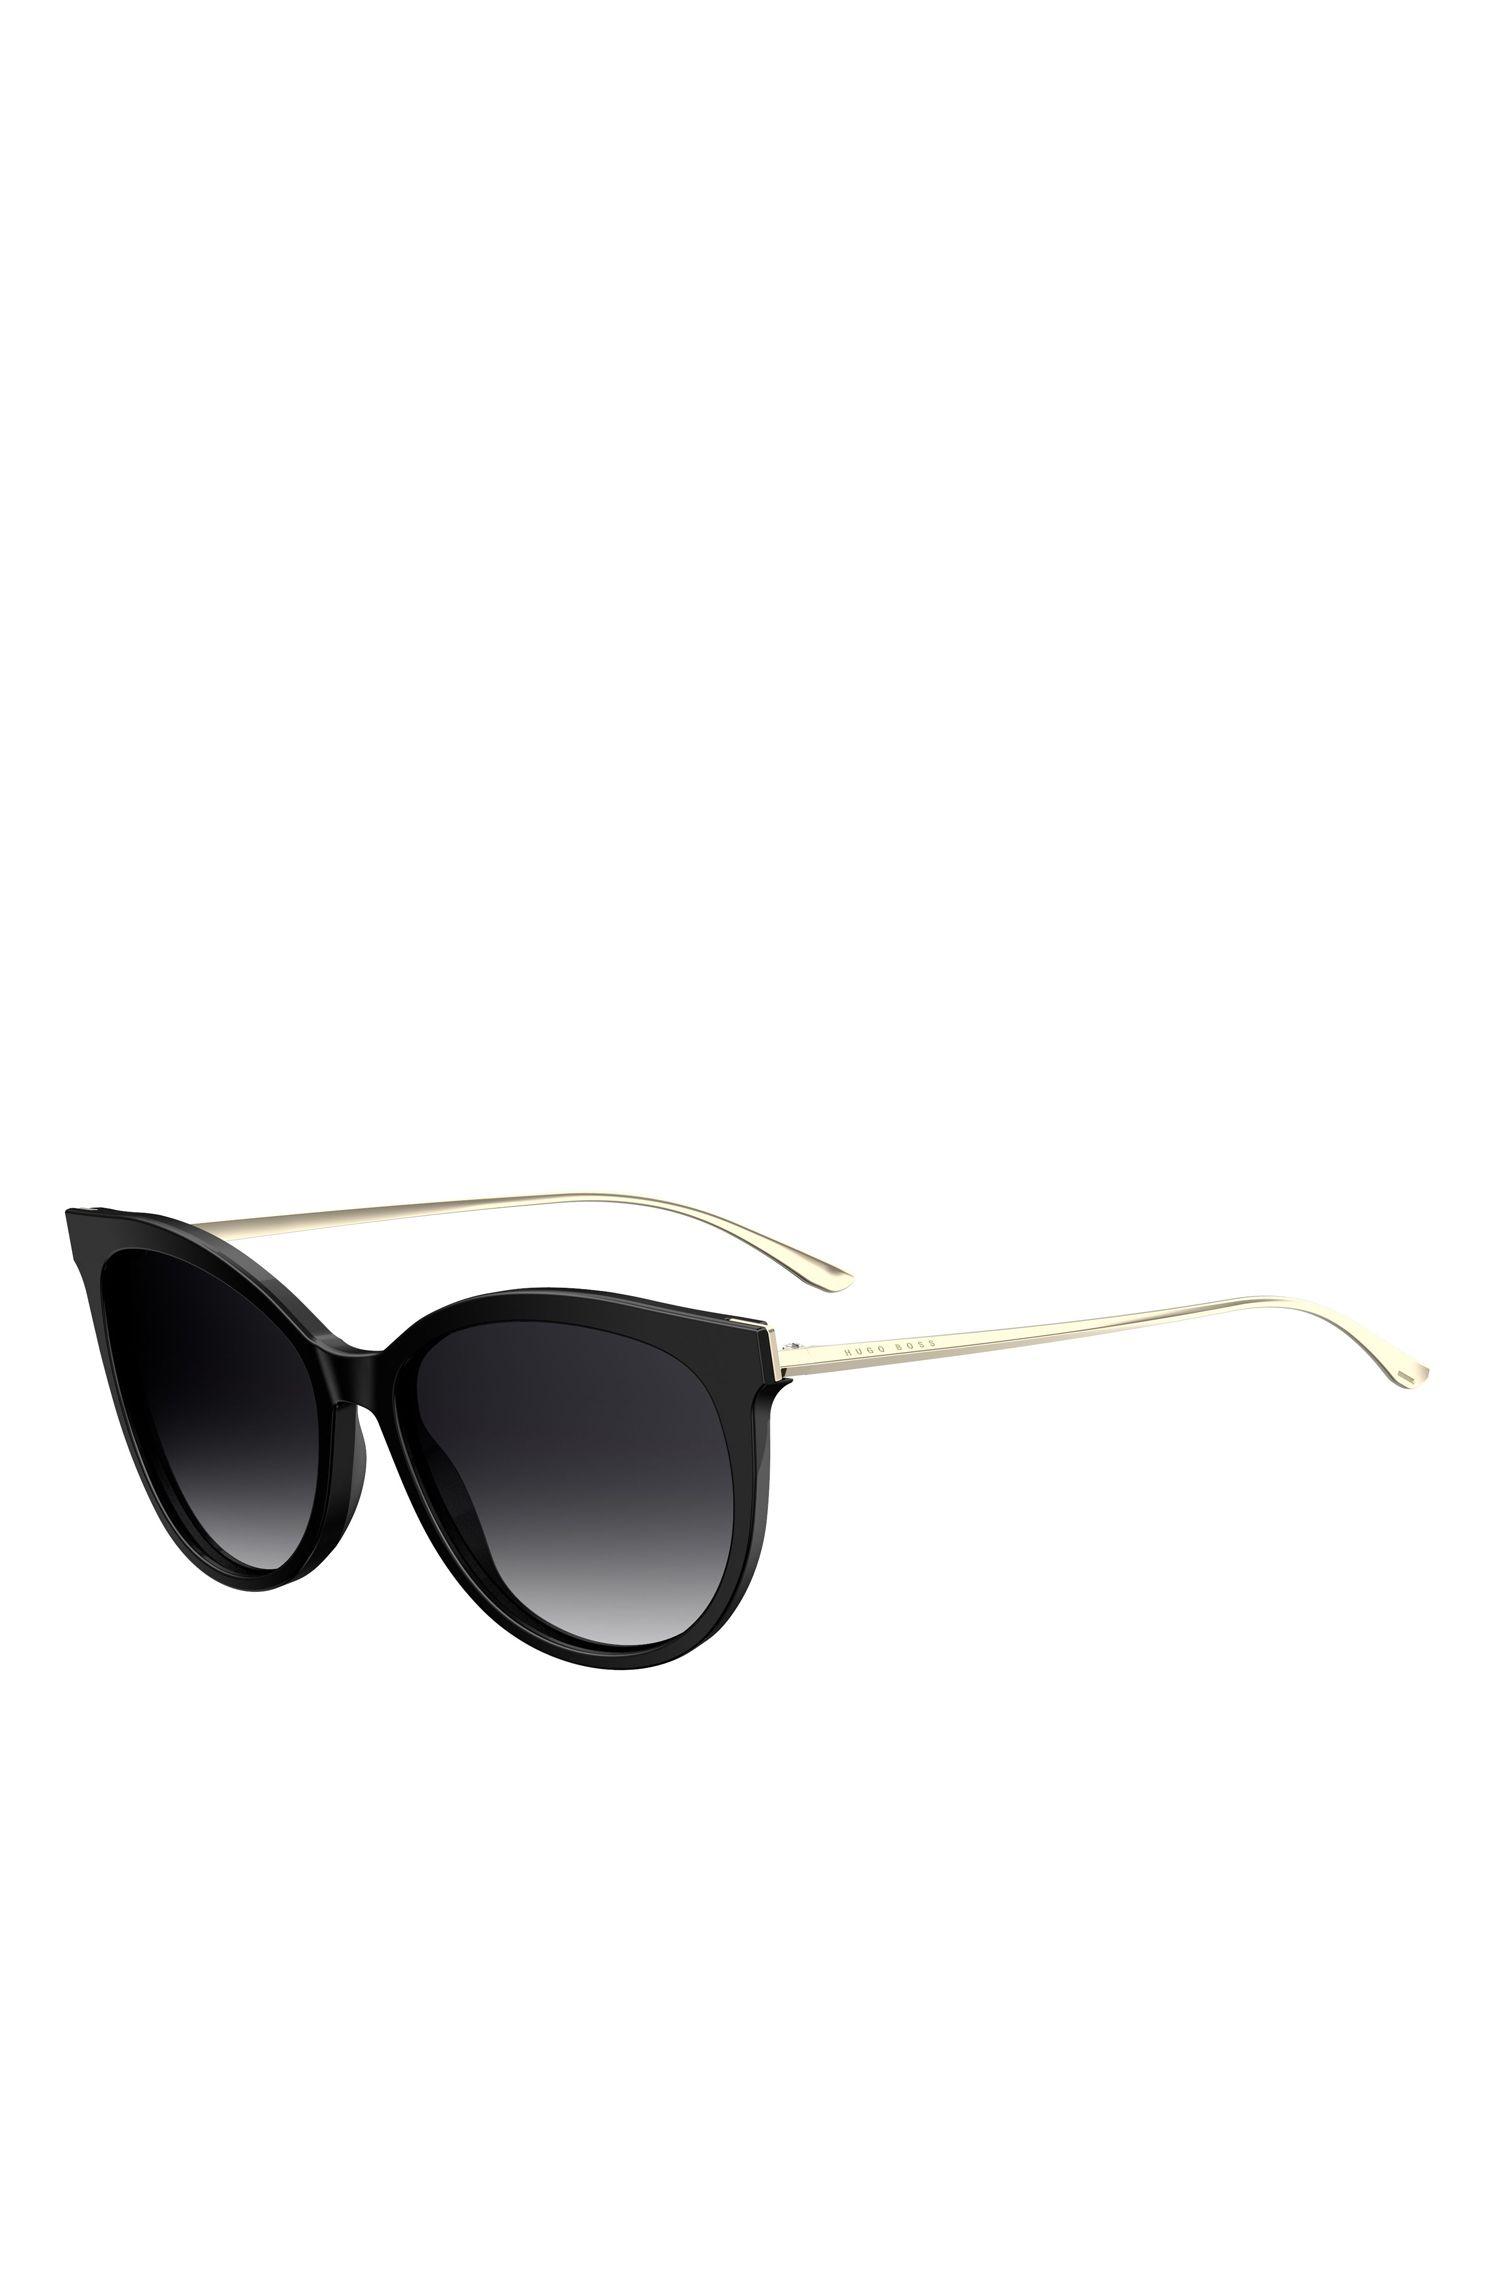 'BOSS 0892S' | Black Cat-eye Sunglasses